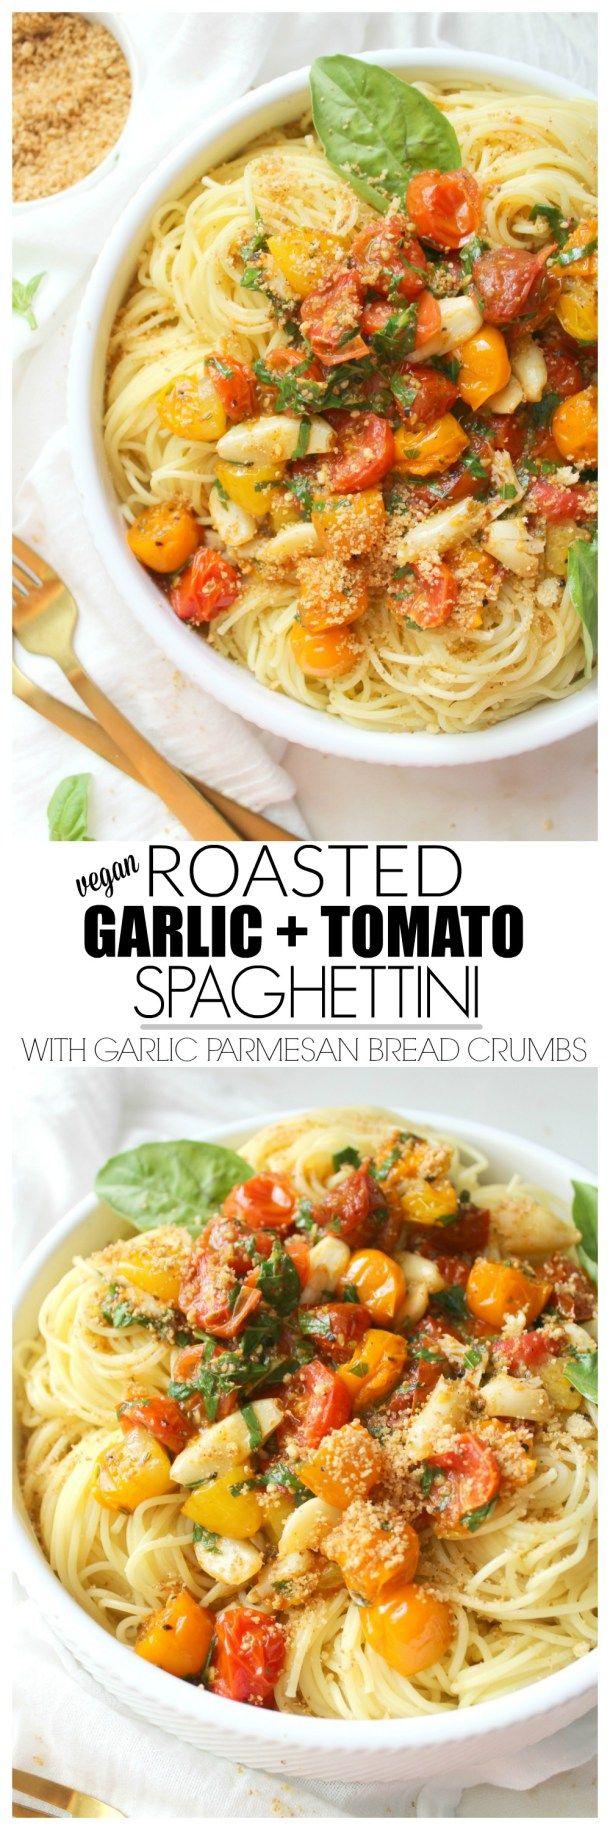 Roasted Garlic Tomato Spaghettini with Garlic Parmesan Bread Crumbs | ThisSavoryVegan.com